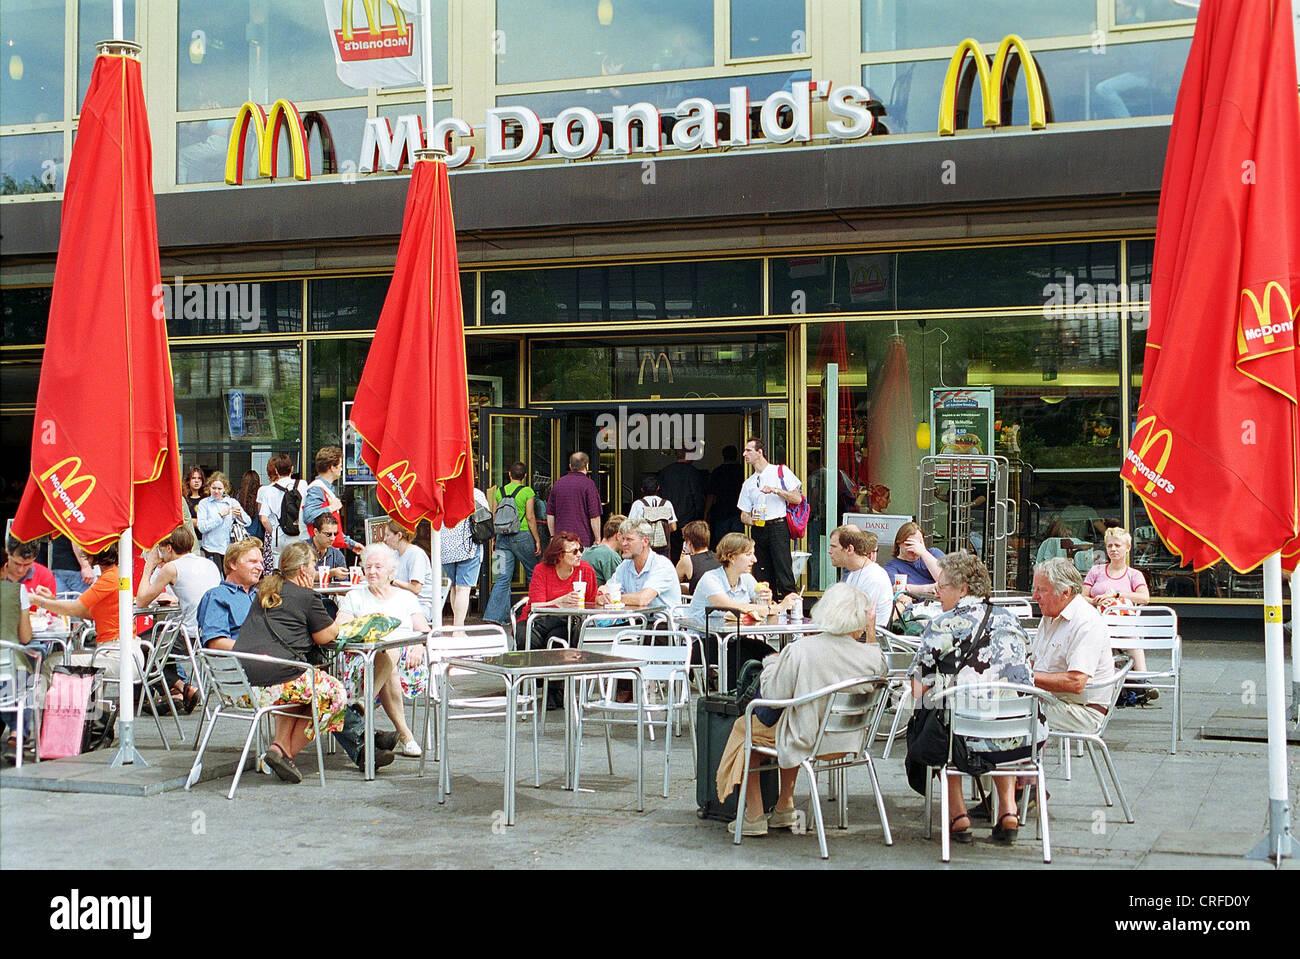 McDonald's At The Zoo Station Berlin Germany Stock Photo